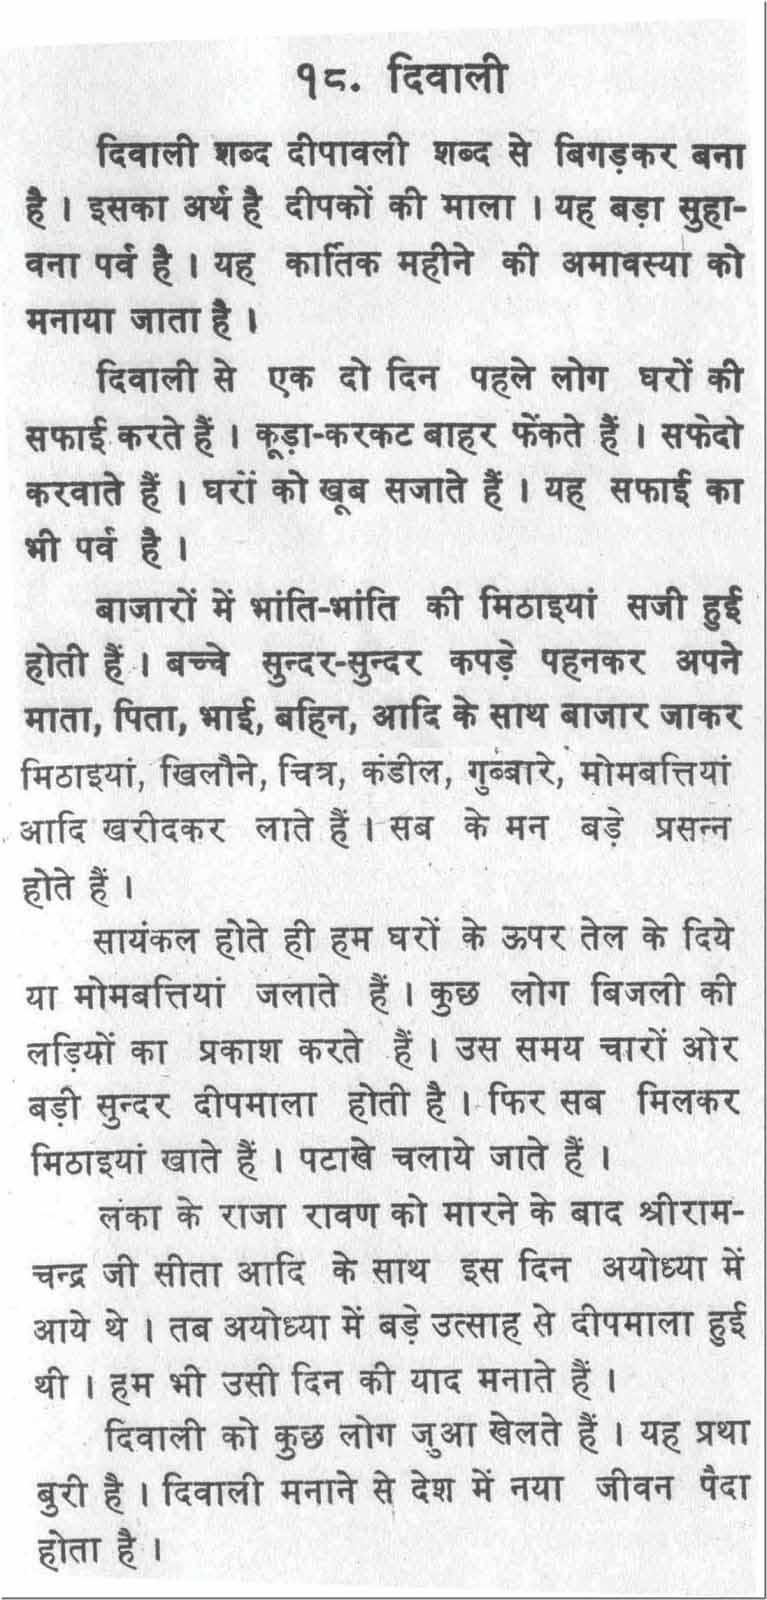 diwali essay wiki diwali essay hindi help leylia com essay on the place of religion in today